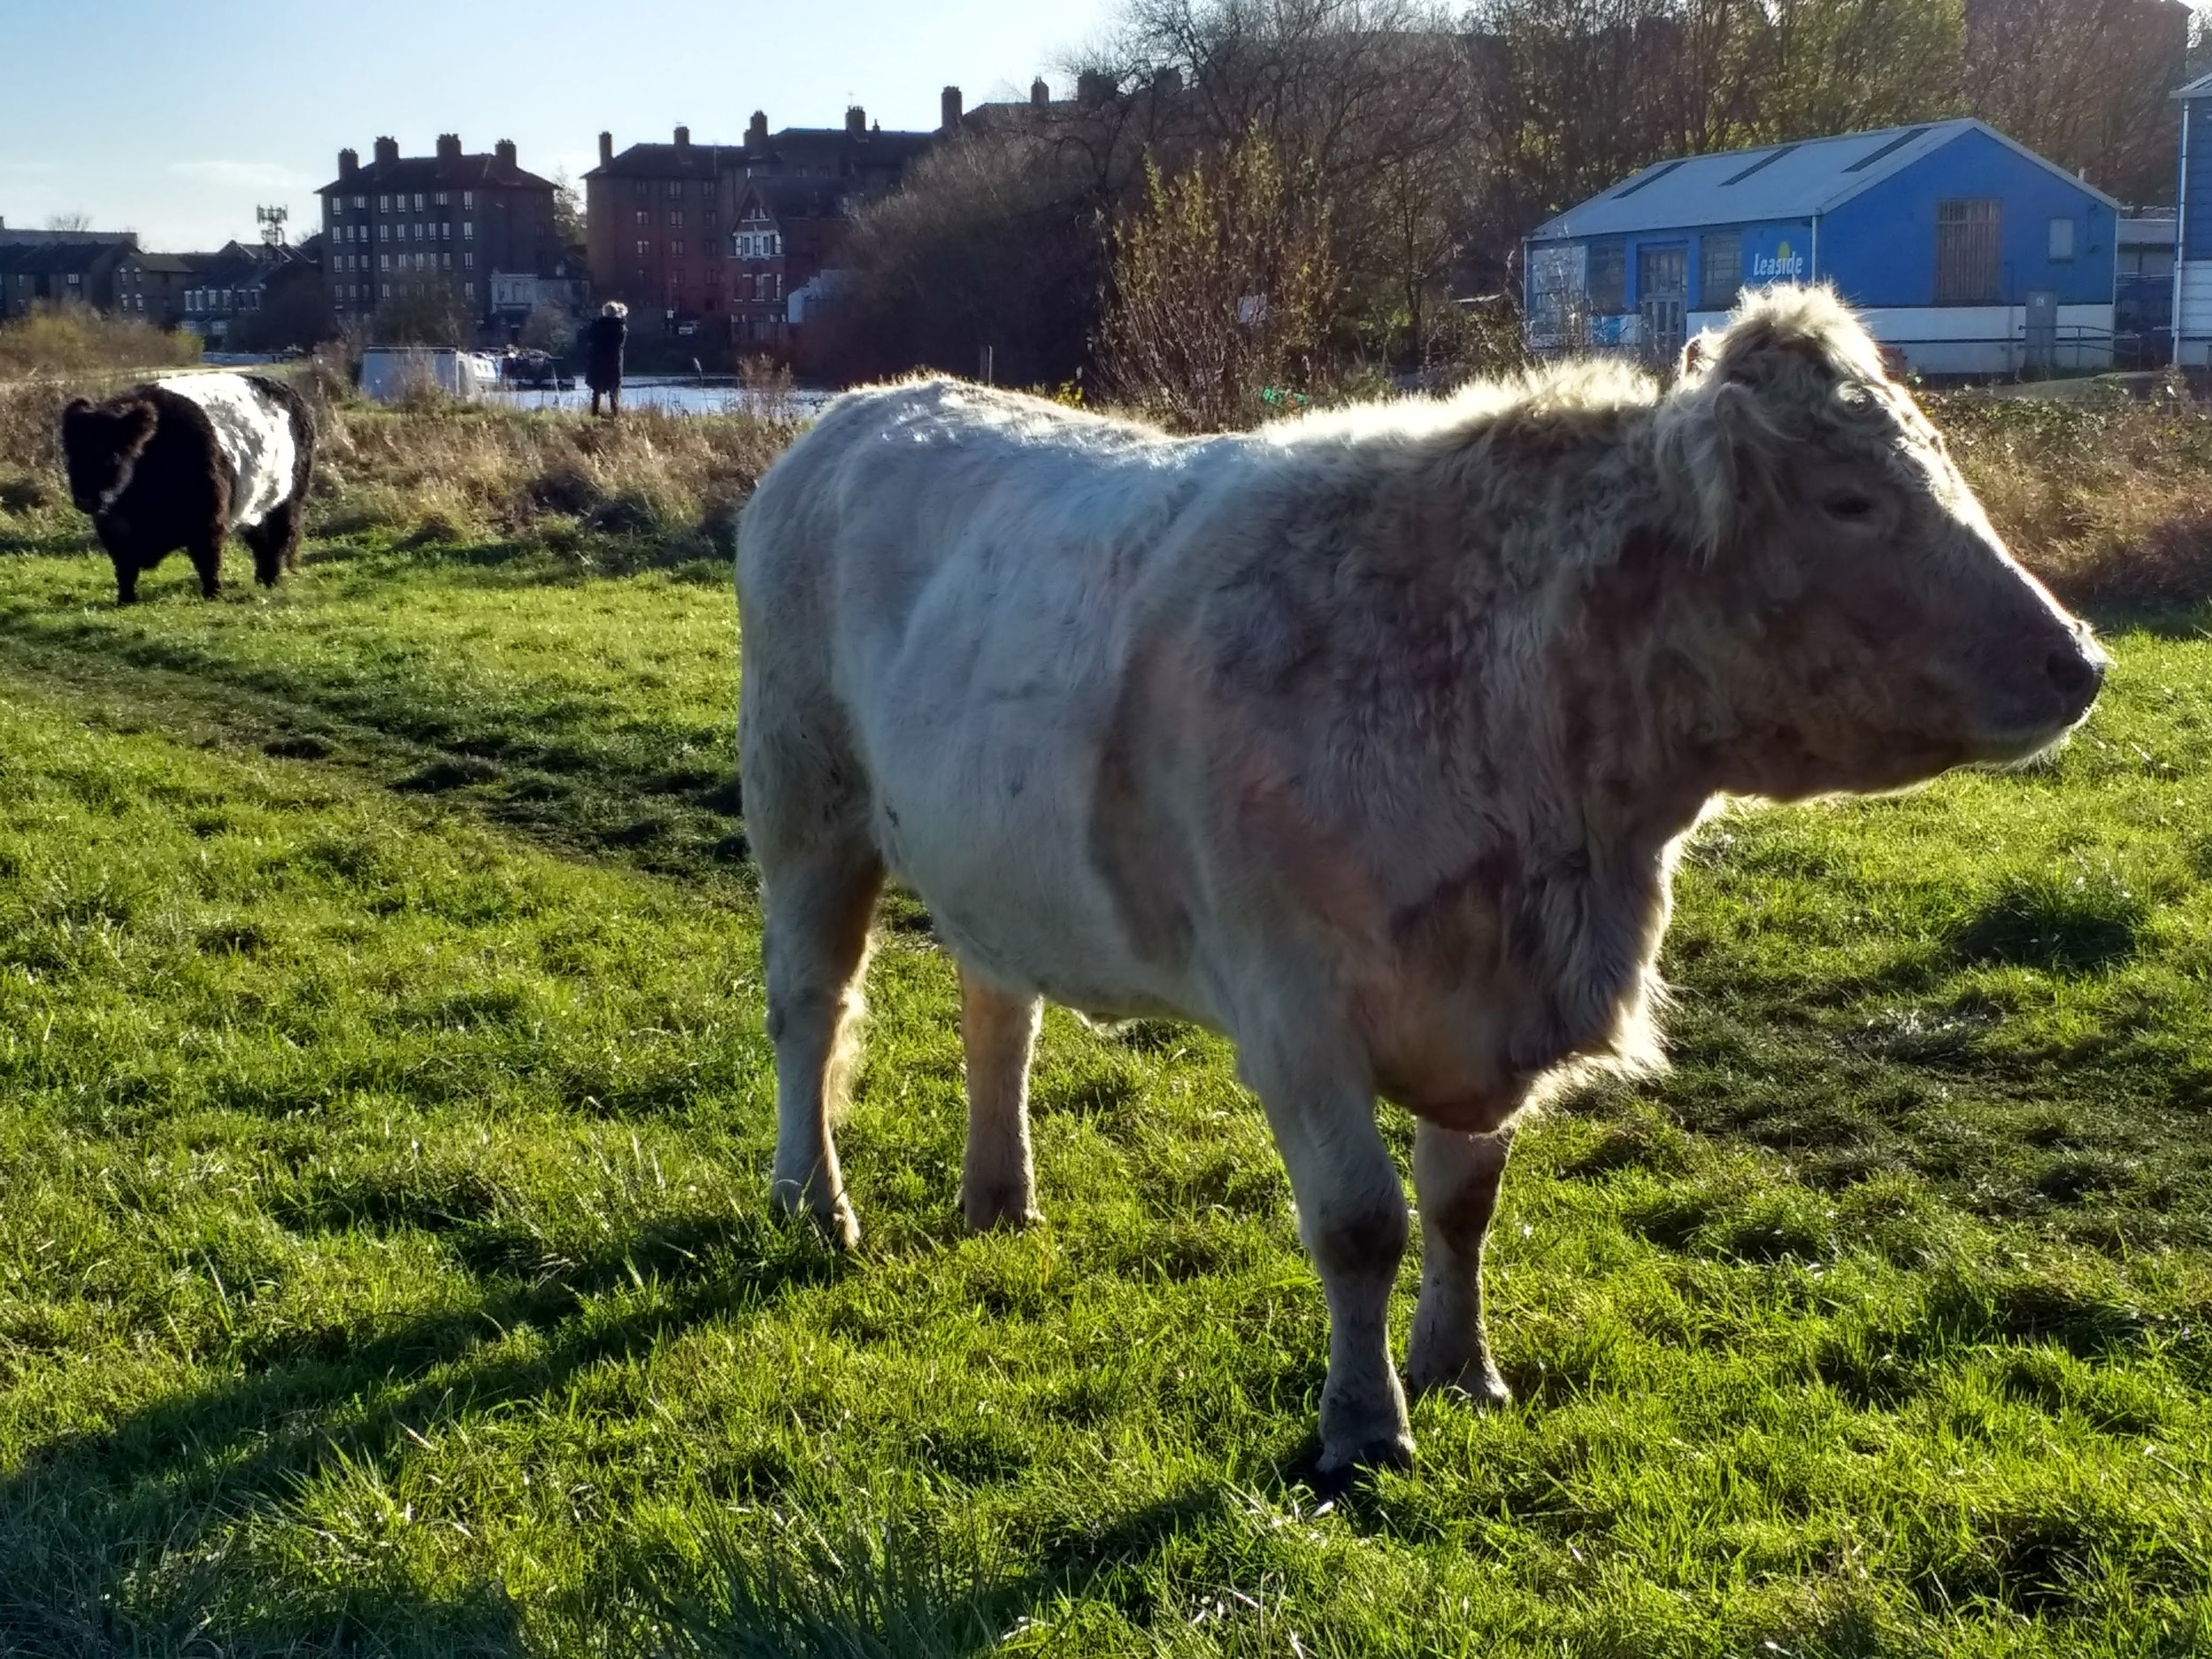 Cattle by the River Lea in Hackney, London